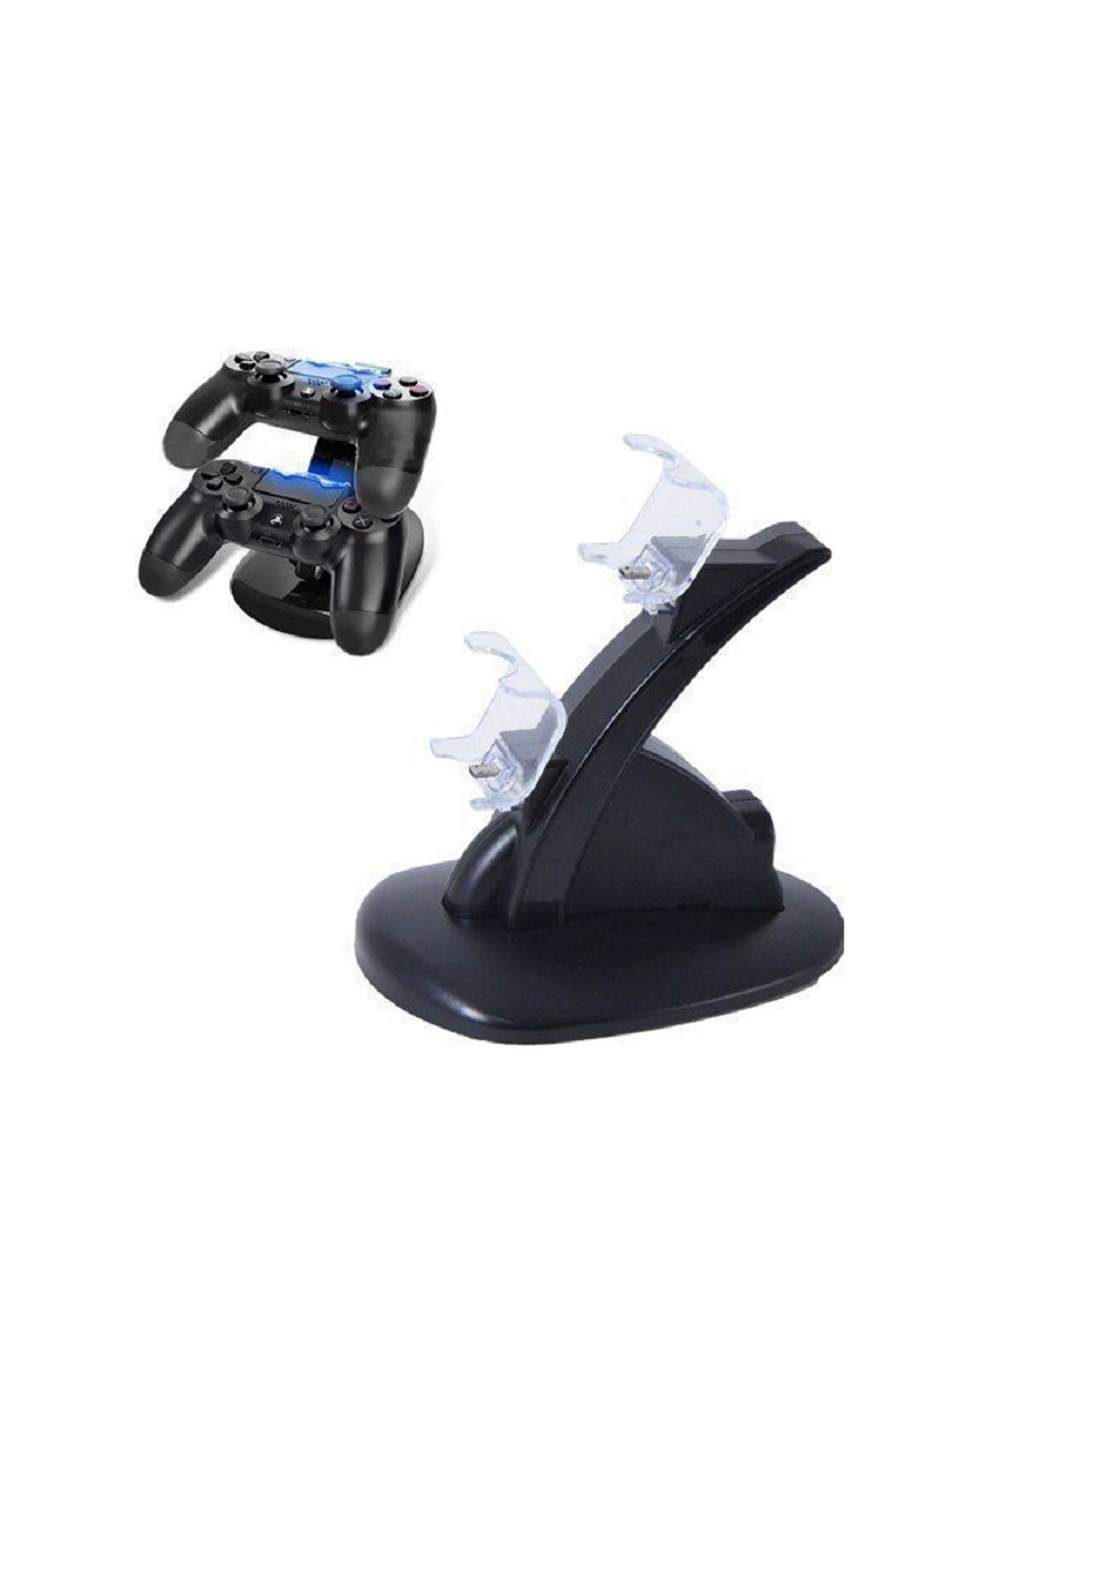 OIVO Dual USB Charging Charger Playstation 4 - Black ستاند شاحن لوحدات التحكم